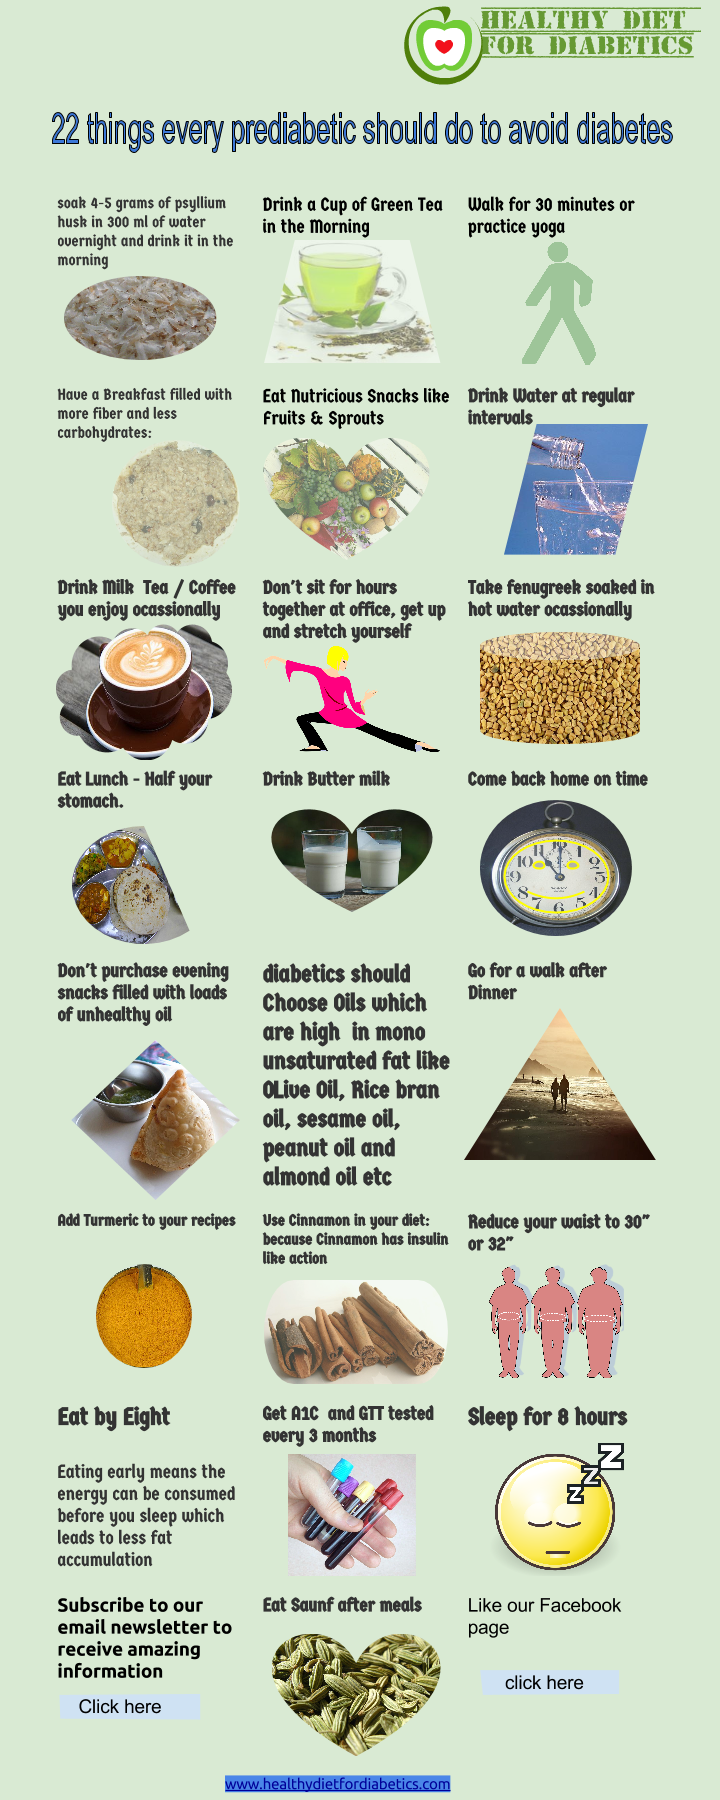 blog de dieta pre-diabetes